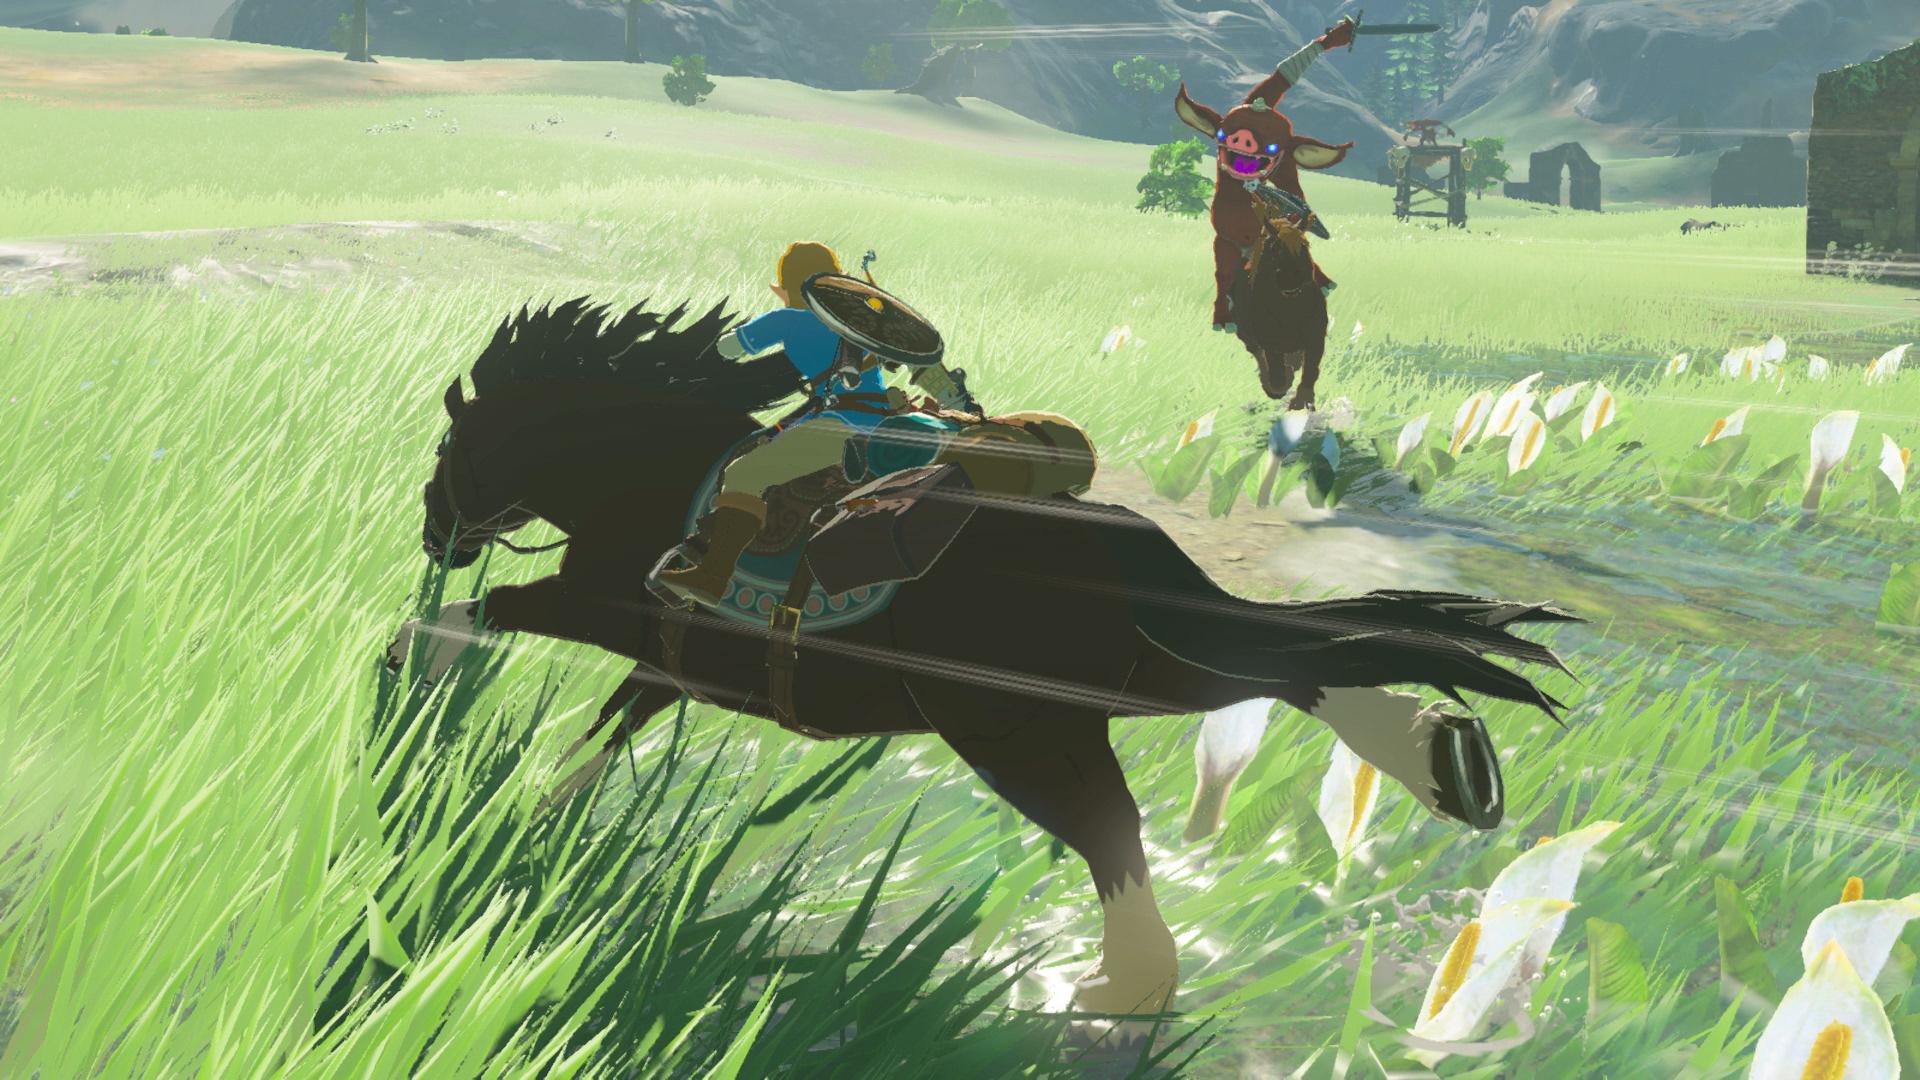 Nové screenshoty z The Legend of Zelda: Breath of the Wild 139305